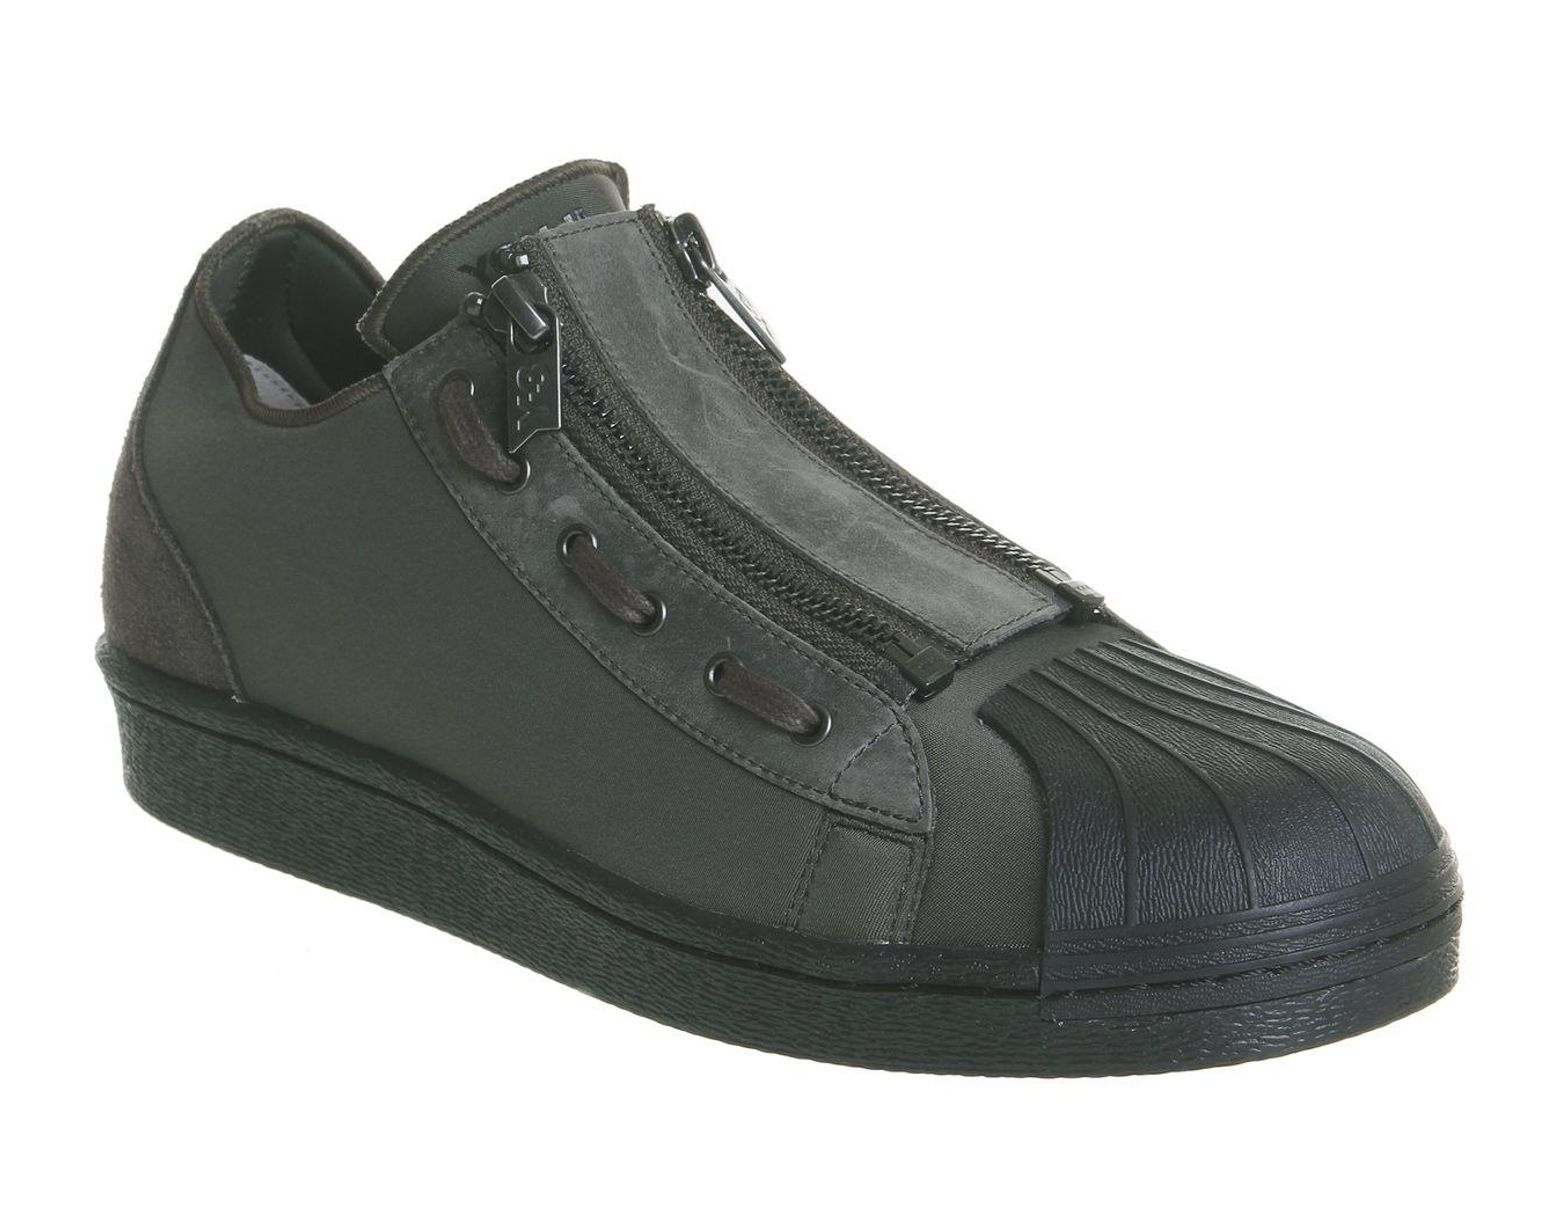 8cefaf1043097 Y-3 Y3 Super Zip in Black for Men - Lyst